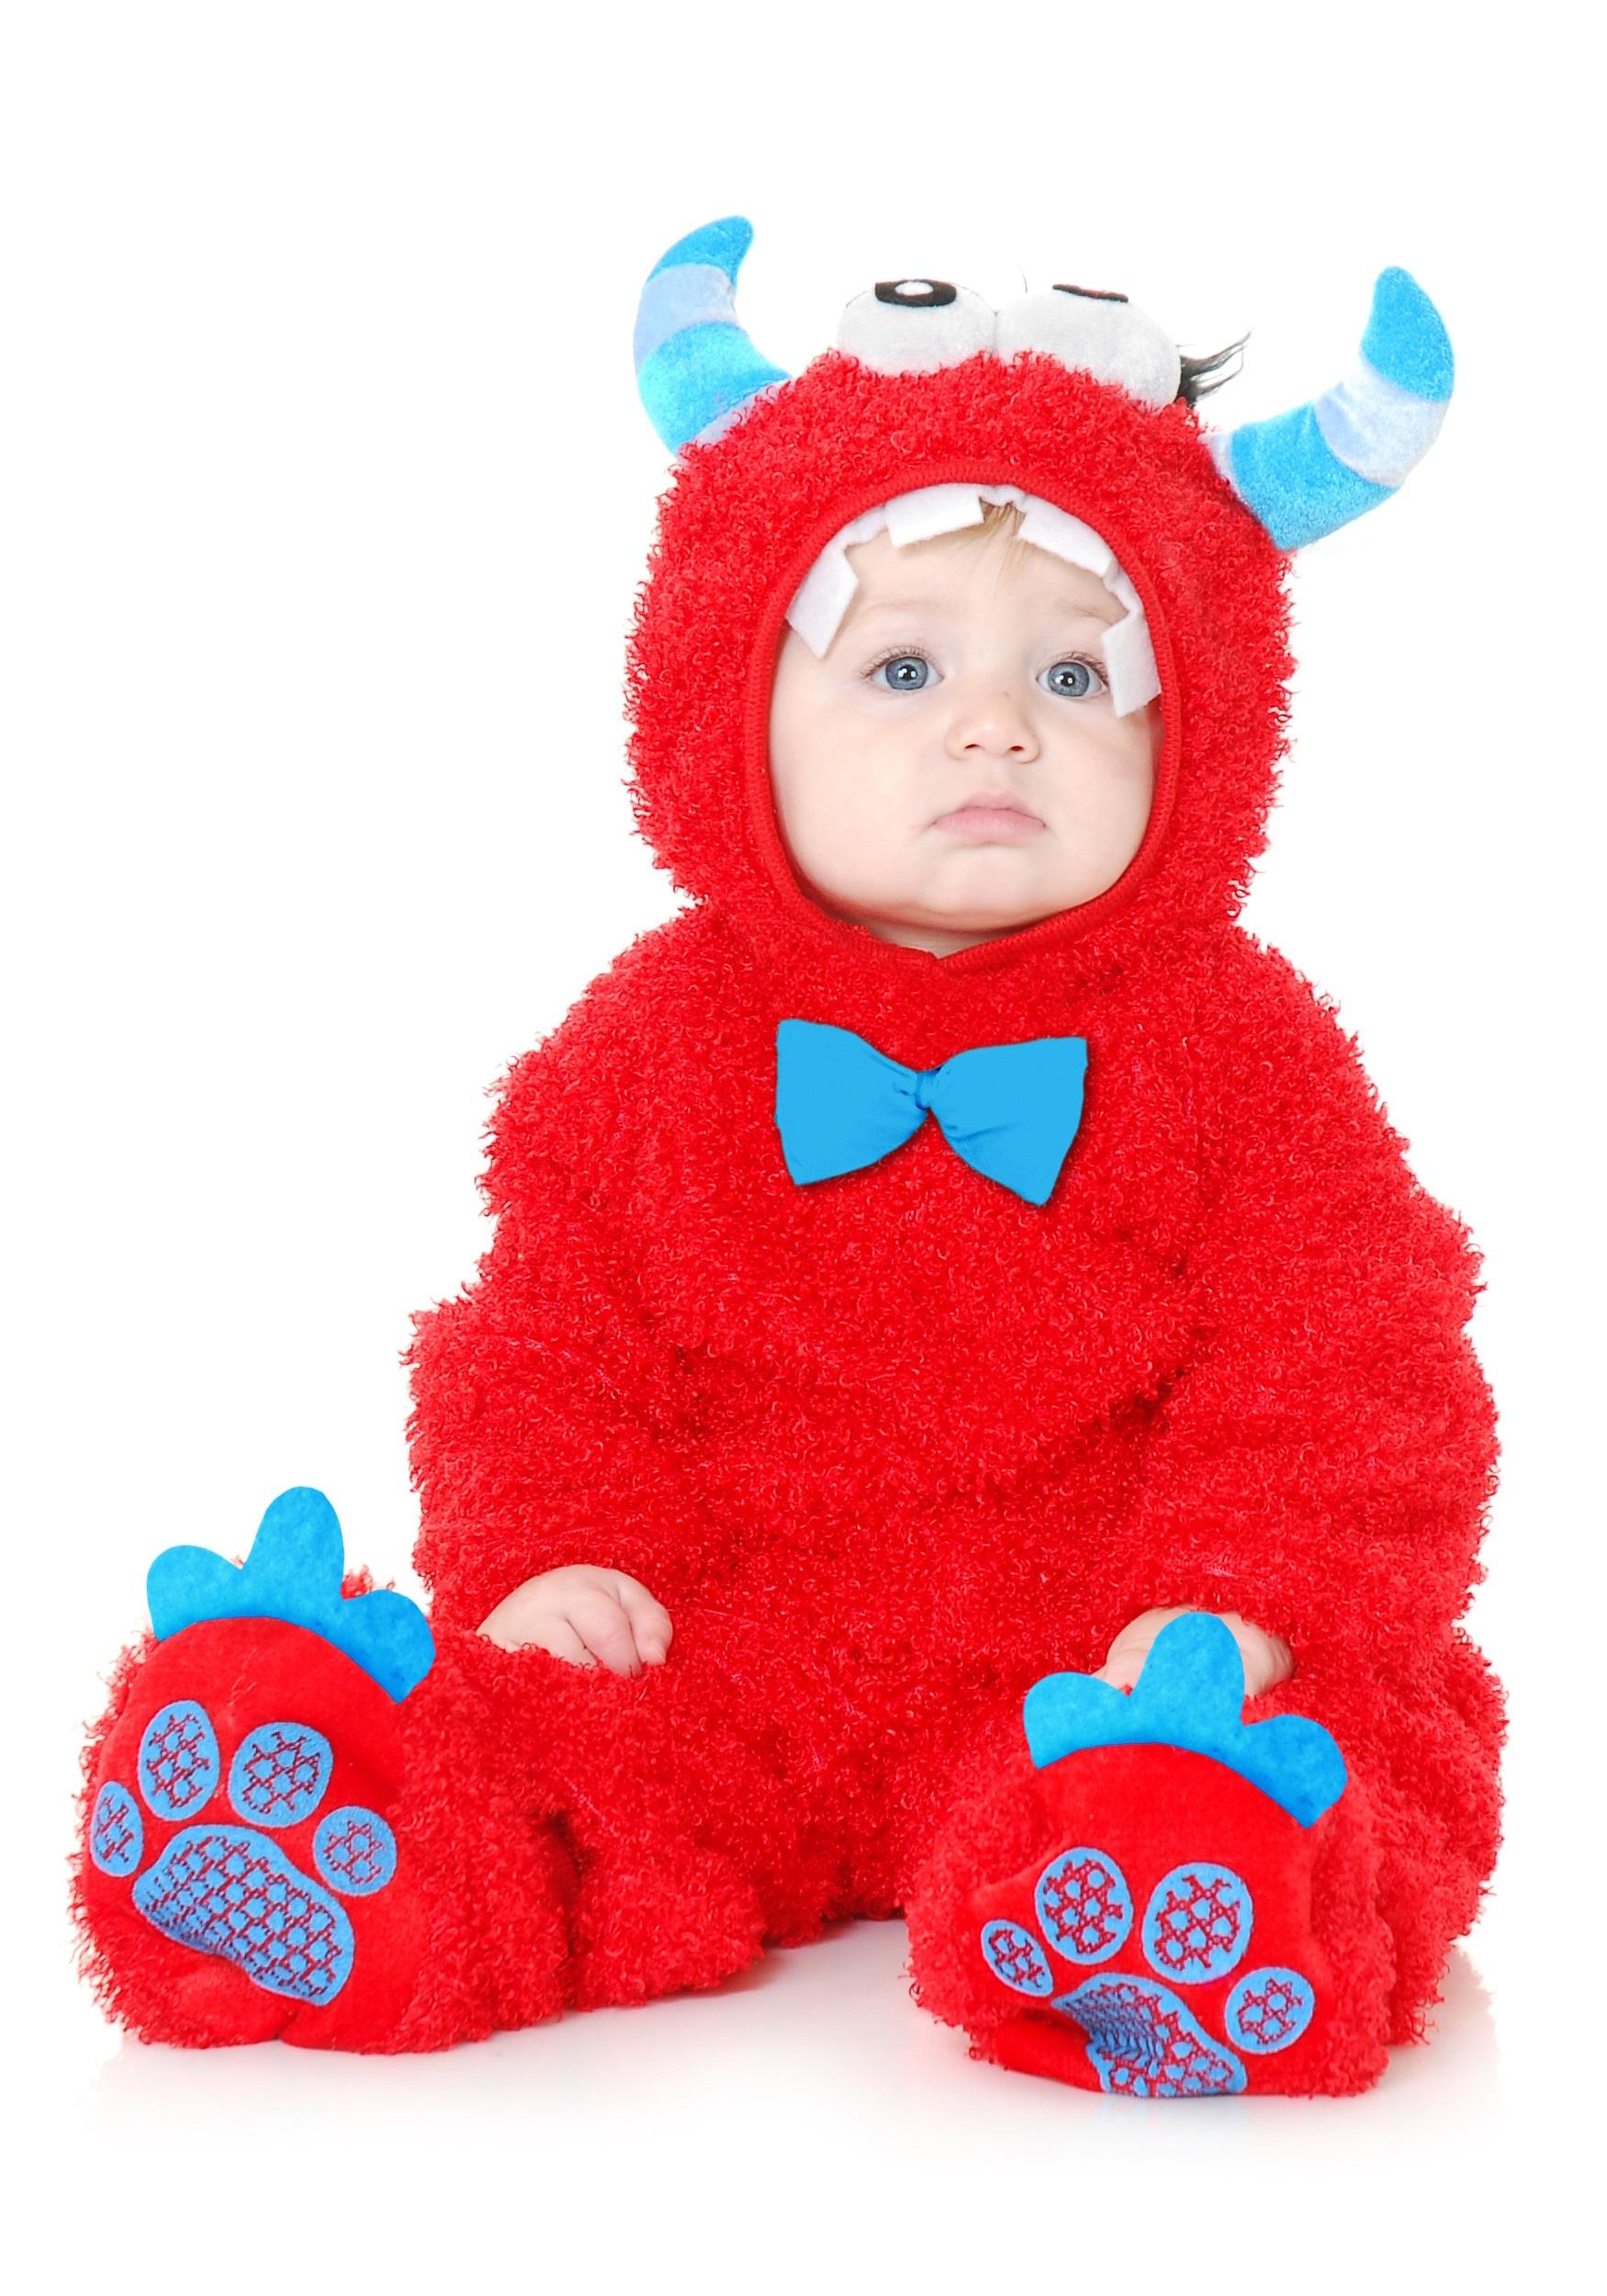 Infant Monster Madness Red u0026 Blue Costume  sc 1 st  Halloween Costumes & Infant Monster Madness Red u0026 Blue Costume - Halloween Costumes